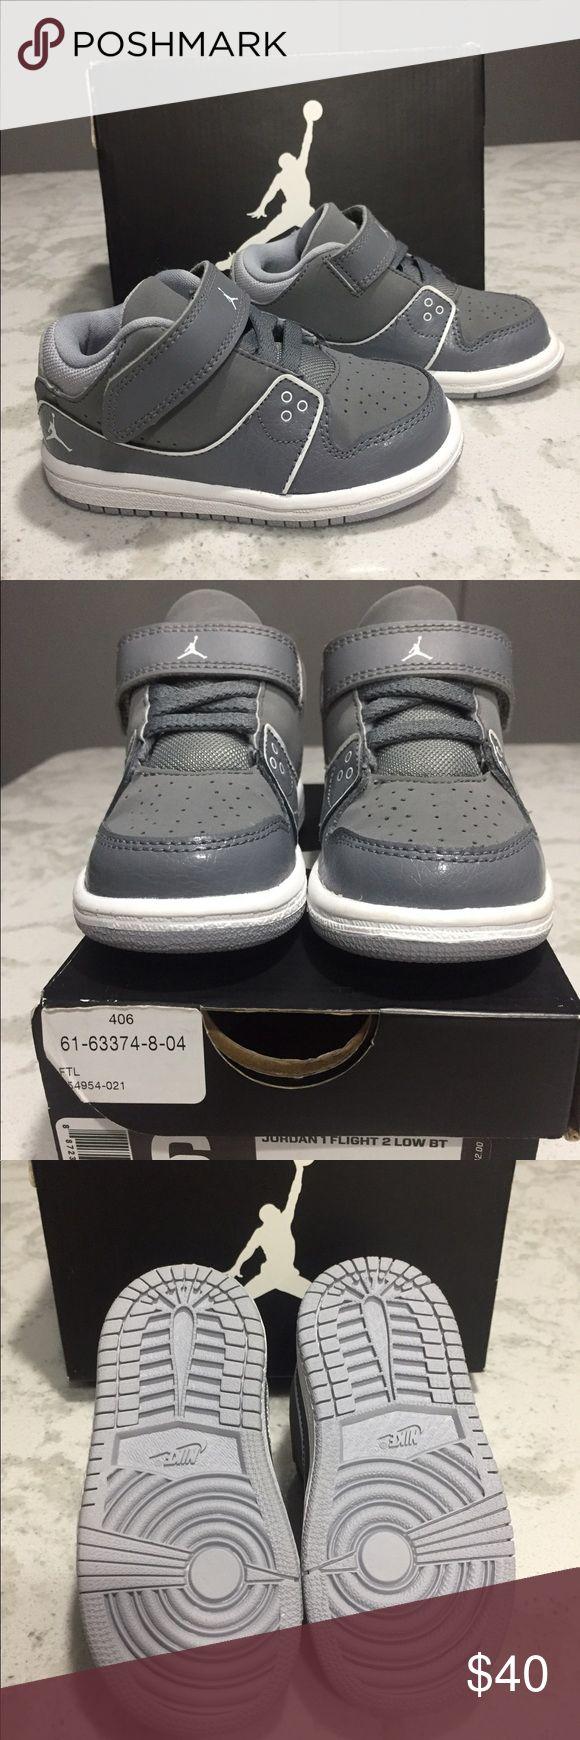 Toddler Jordan Sneakers BRAND NEW JORDANS! Toddler Flights. Jordan Shoes Sneakers